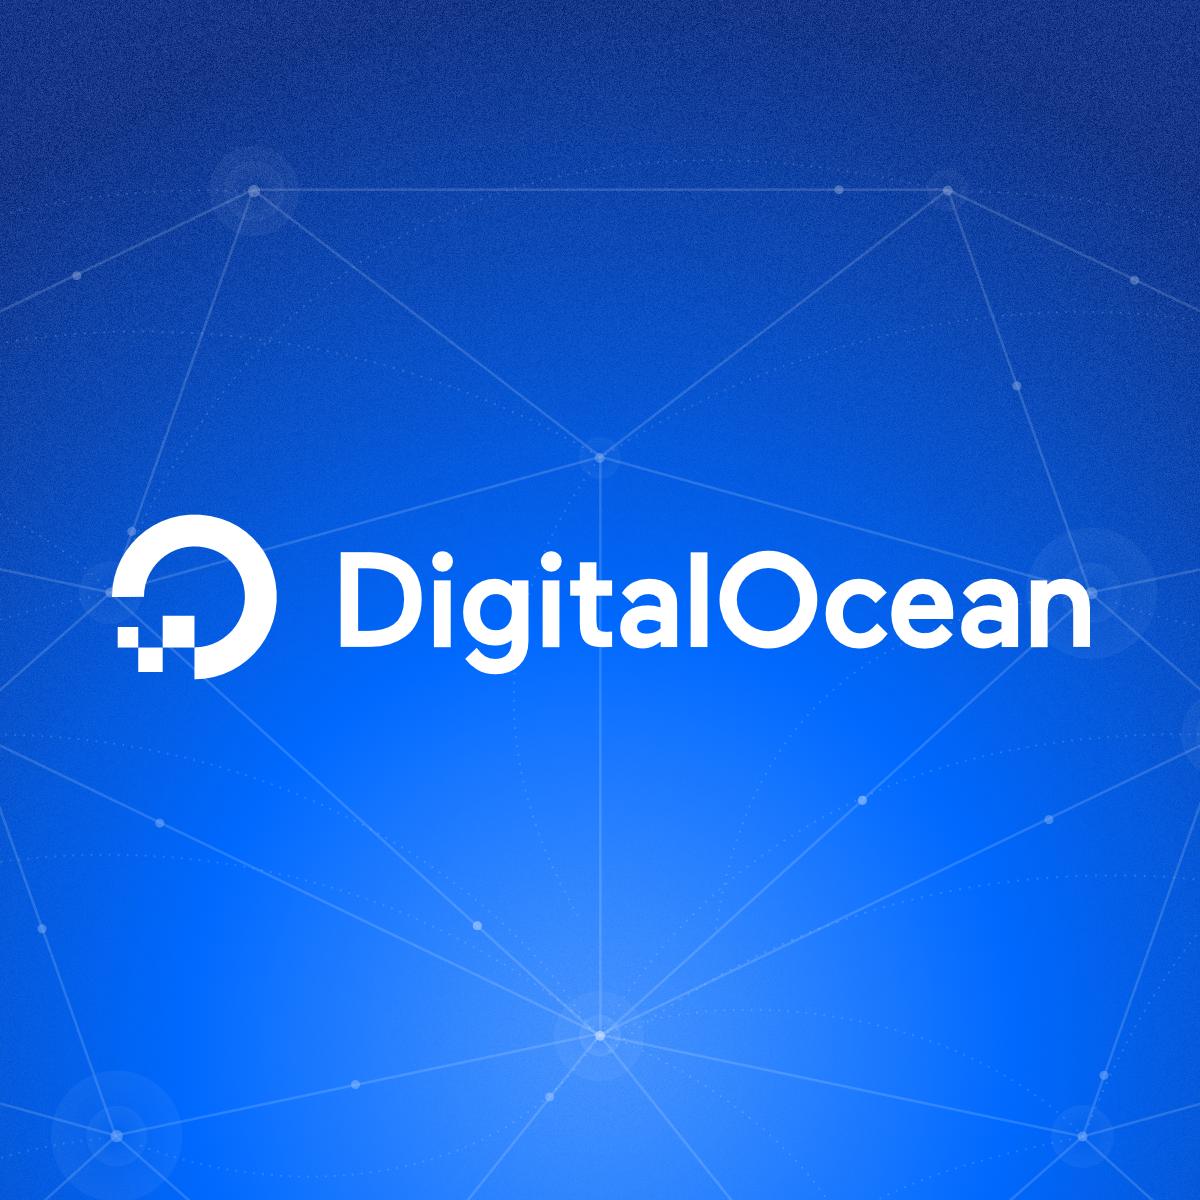 DigitalOcean – Simplicity with an Active User Community